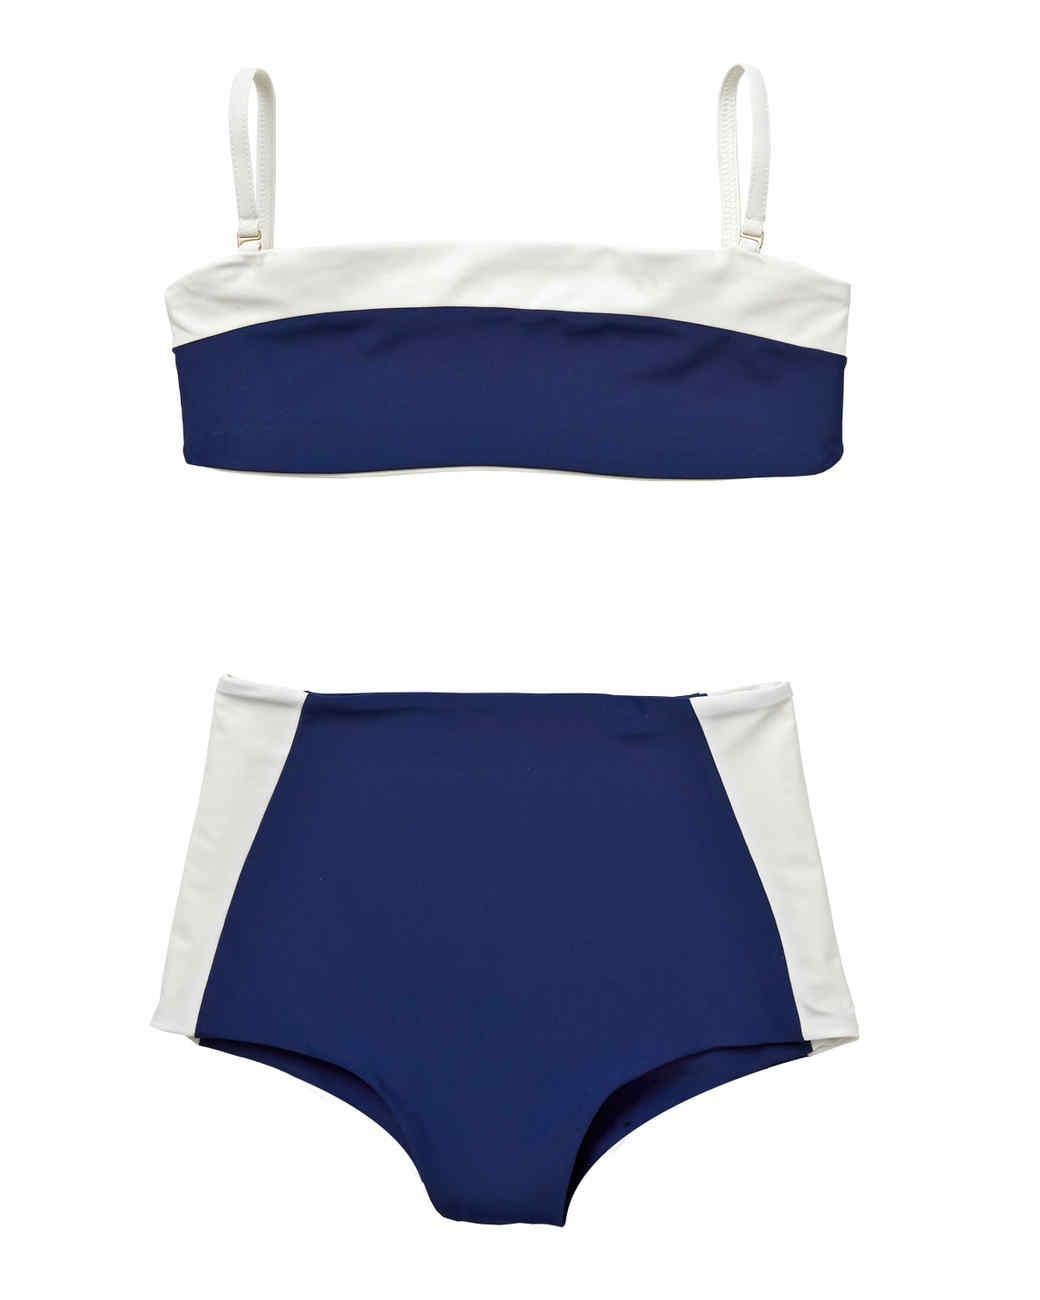 editors-picks-0816-bathing-suits--cocodune-131-d113014_l.jpg